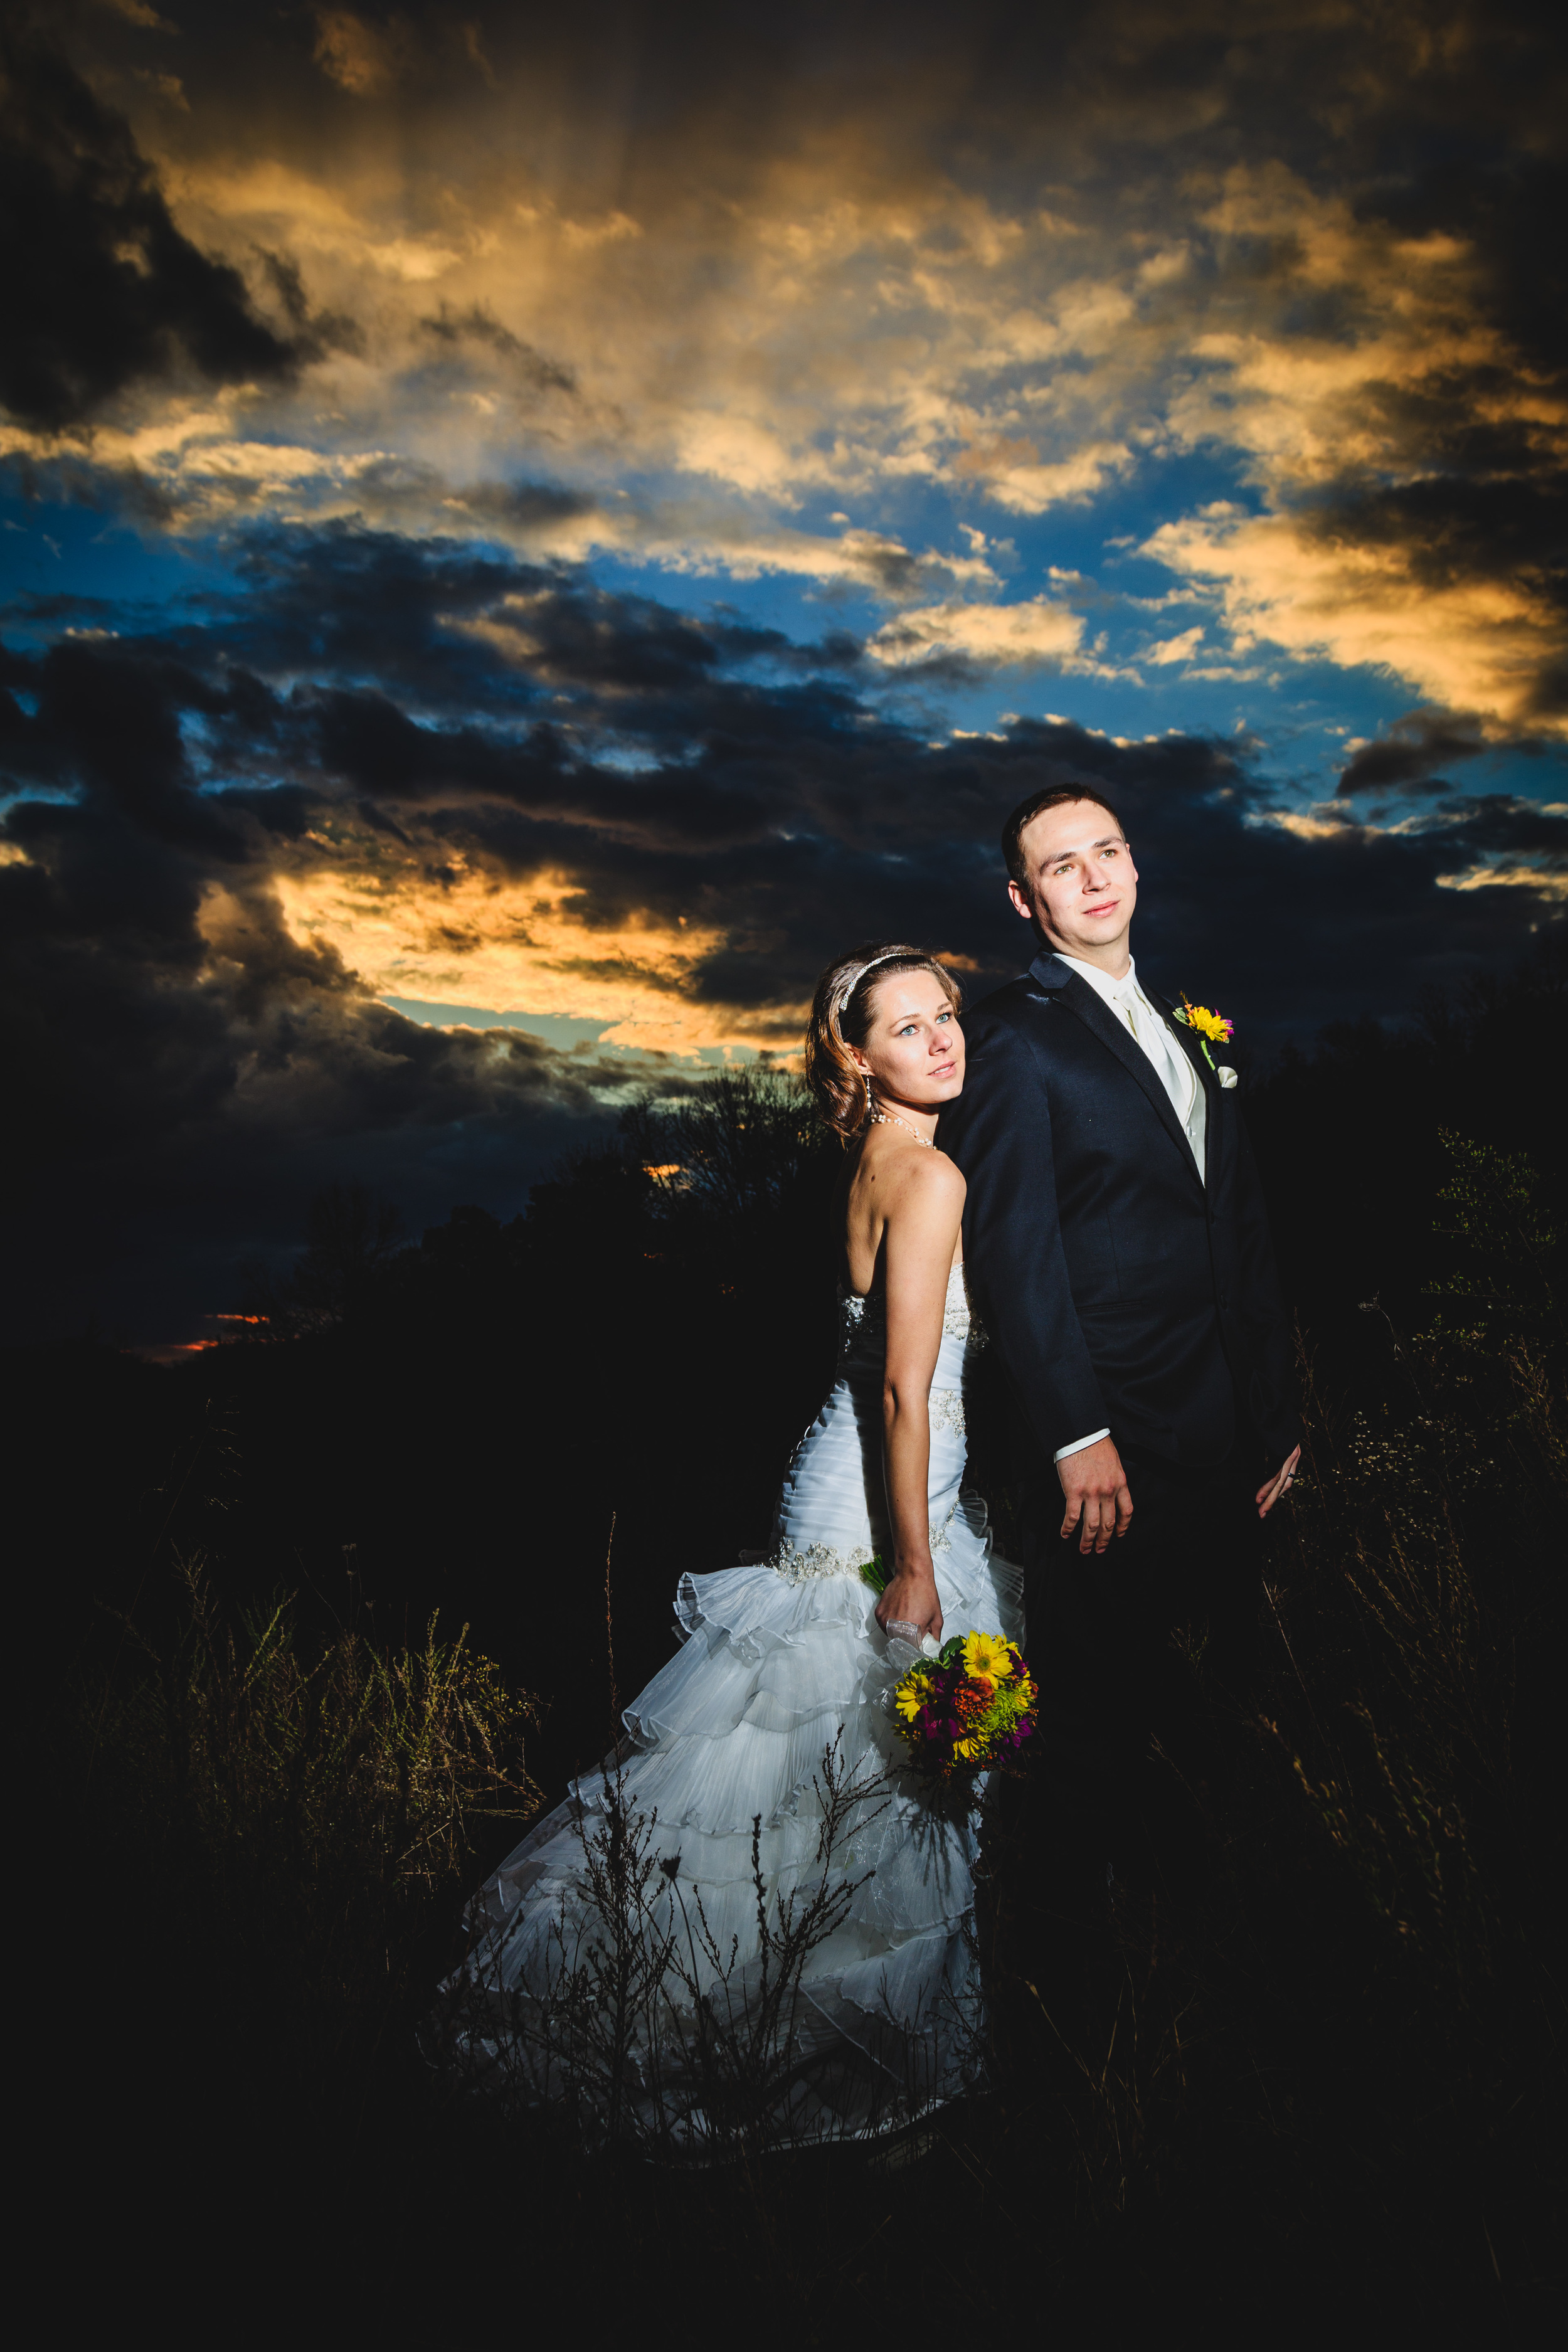 professional-wedding-photography-gatlinburg.jpg